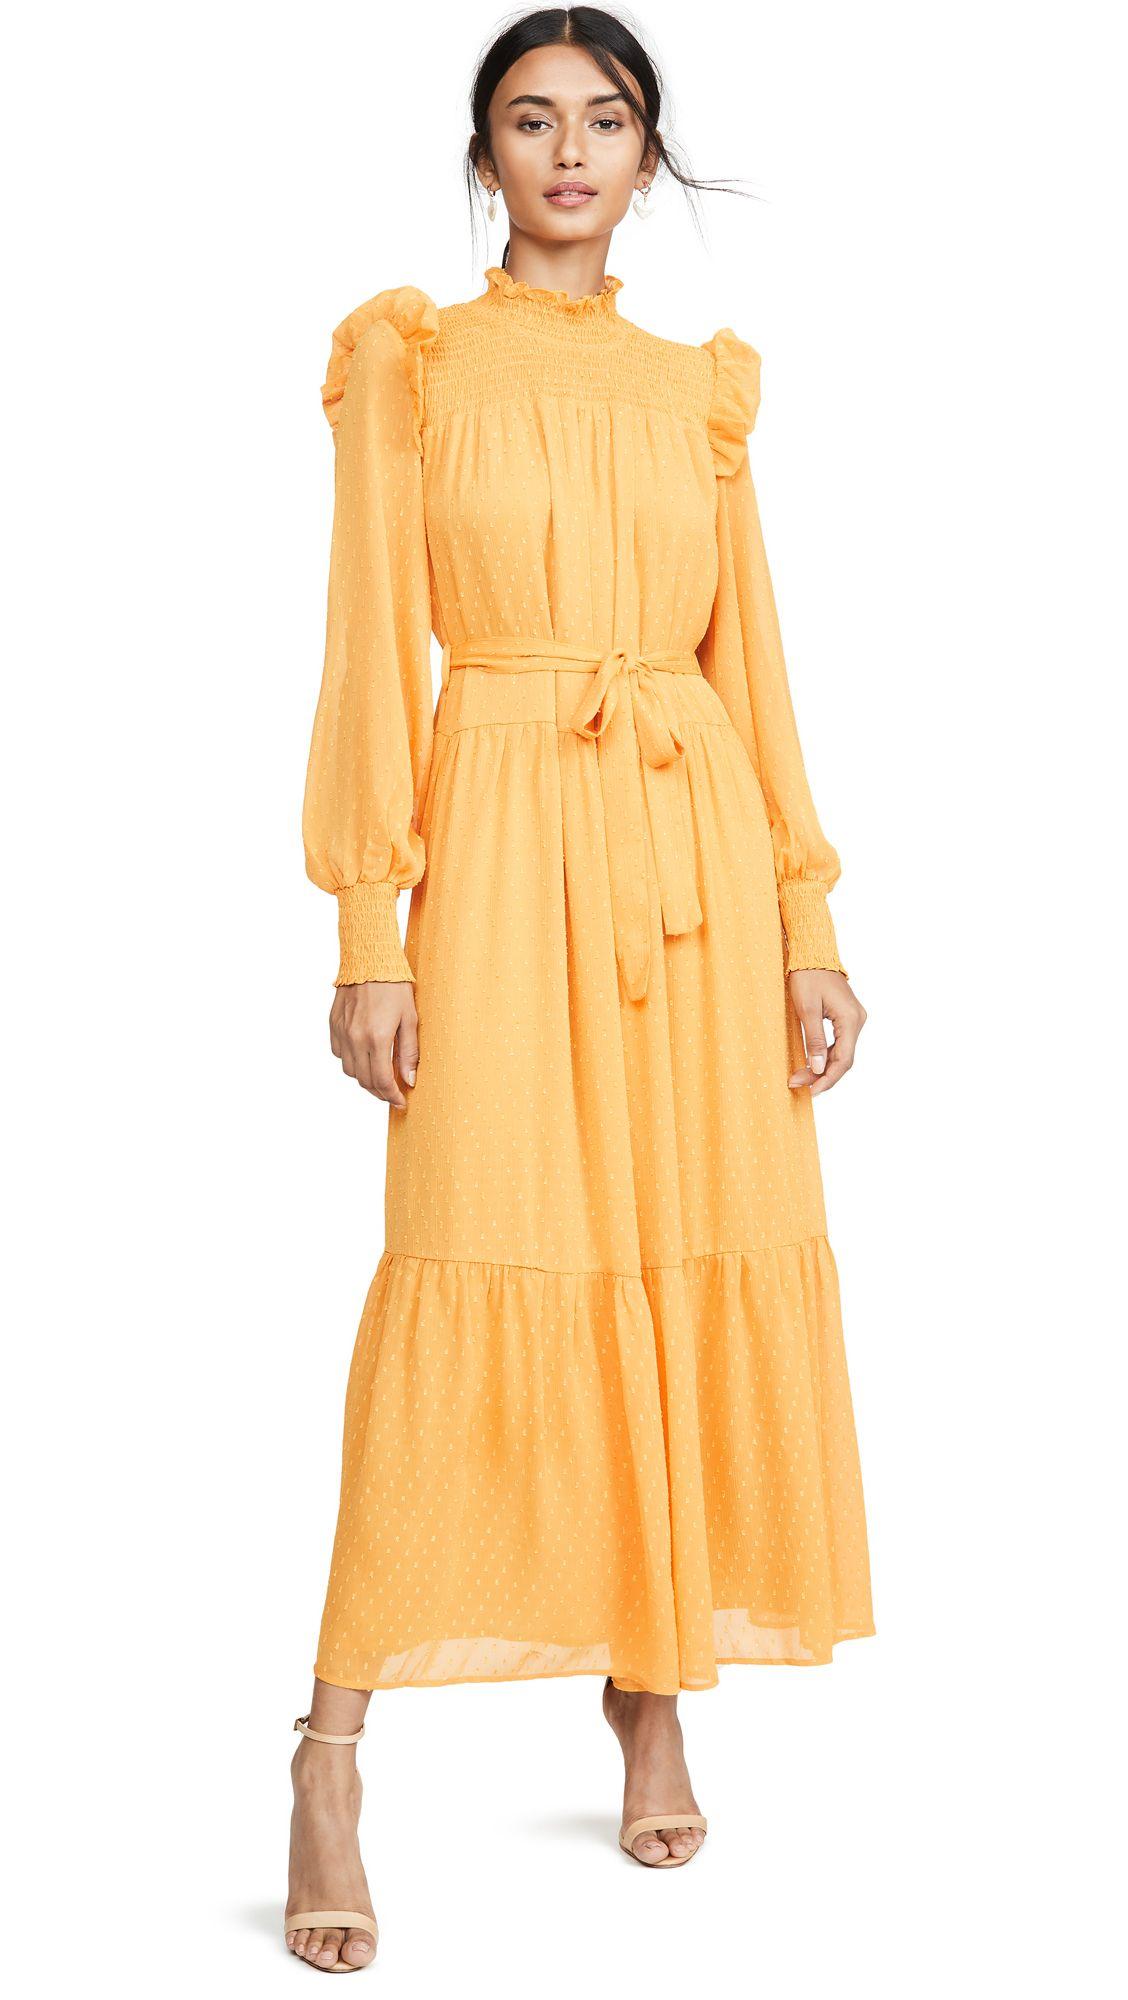 English Factory Swiss Dot Smocked Maxi Dress Shopbop In 2020 Smocked Maxi Dresses Designer Dresses Casual Maxi Dress [ 2000 x 1128 Pixel ]